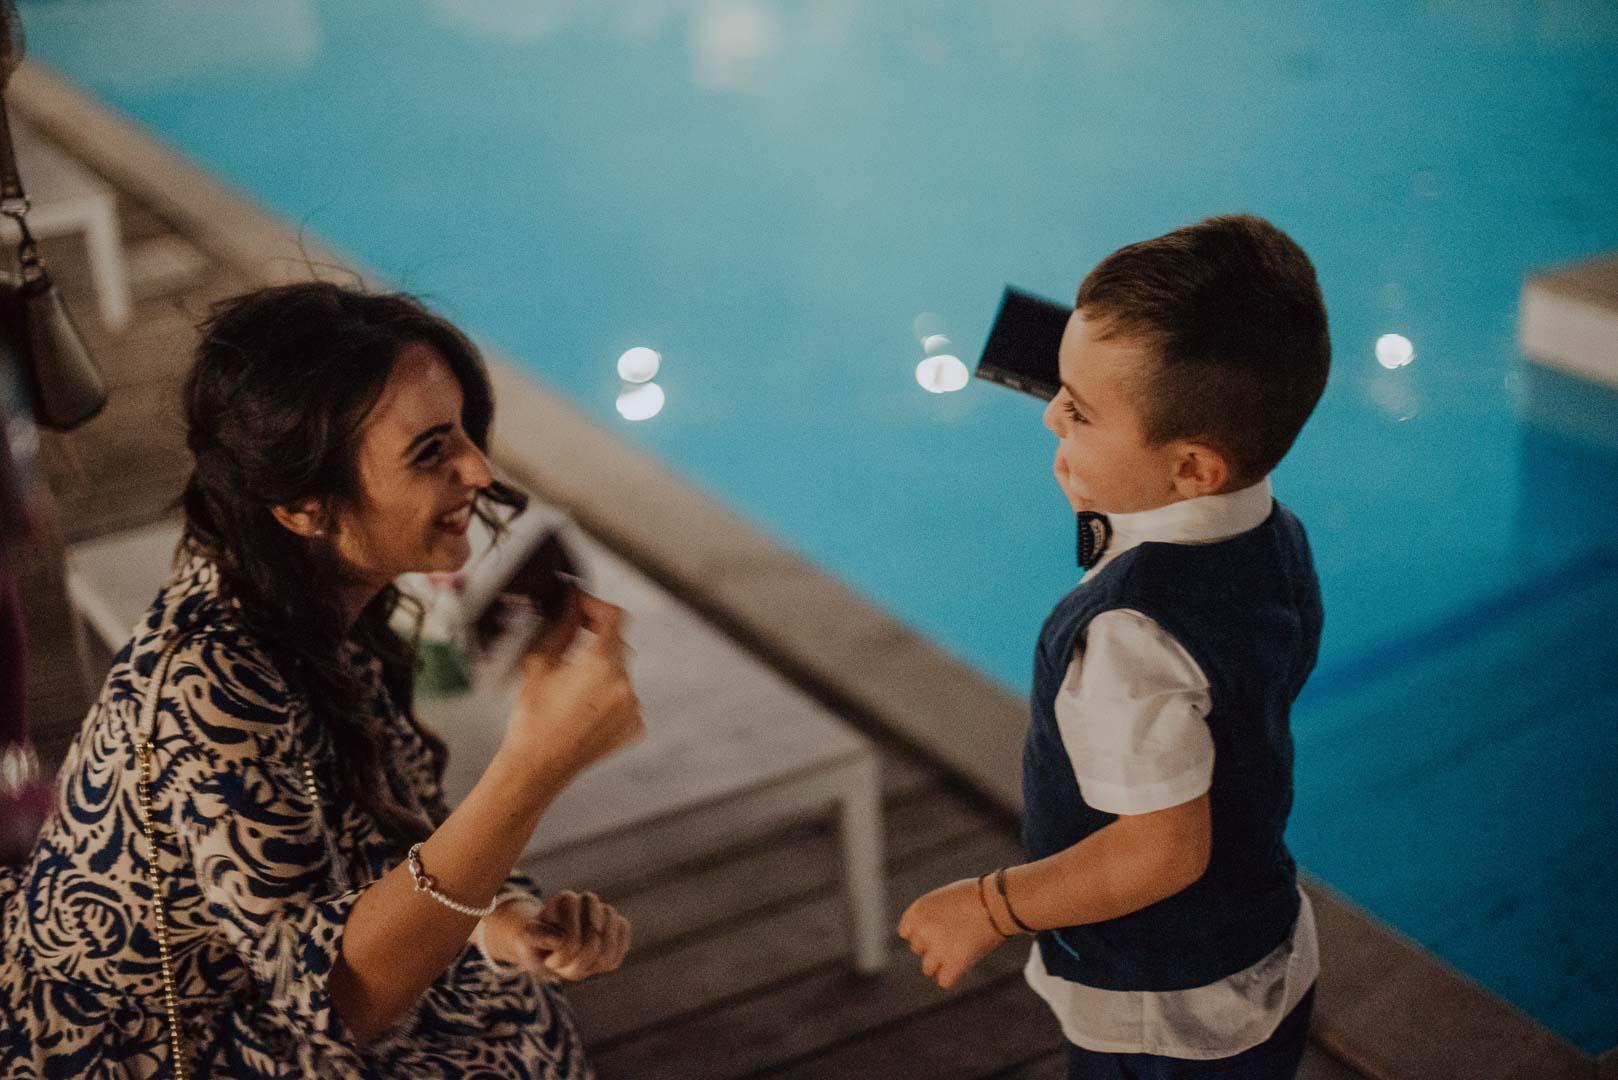 wedding-photographer-destination-fineart-bespoke-reportage-napoli-nabilah-vivianeizzo-spazio46-158